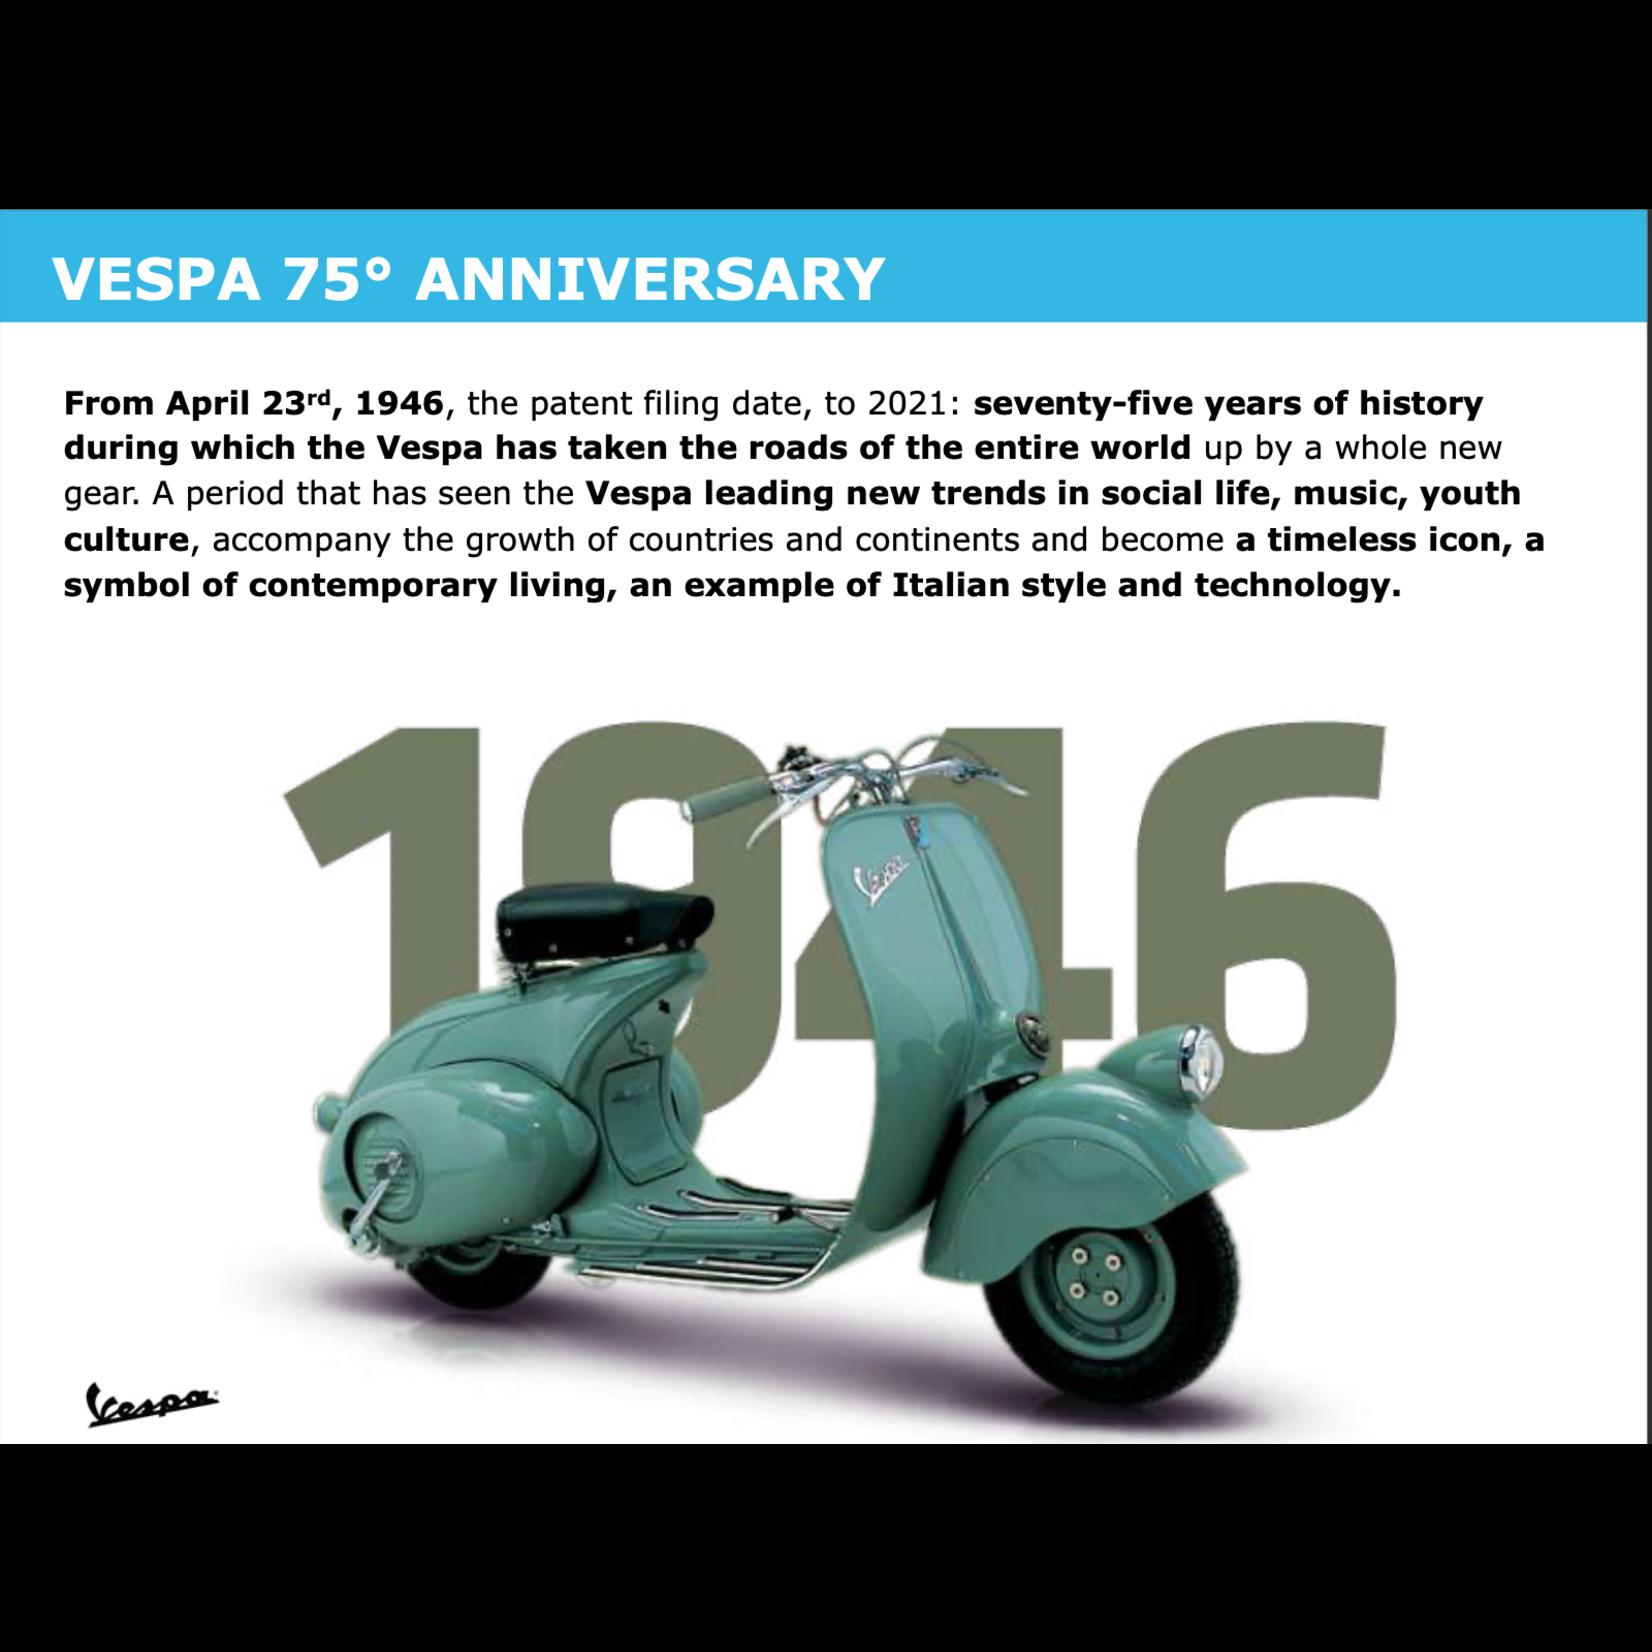 Vehicles Vespa, 2021 Primavera 150 75th Anniversary Celebration